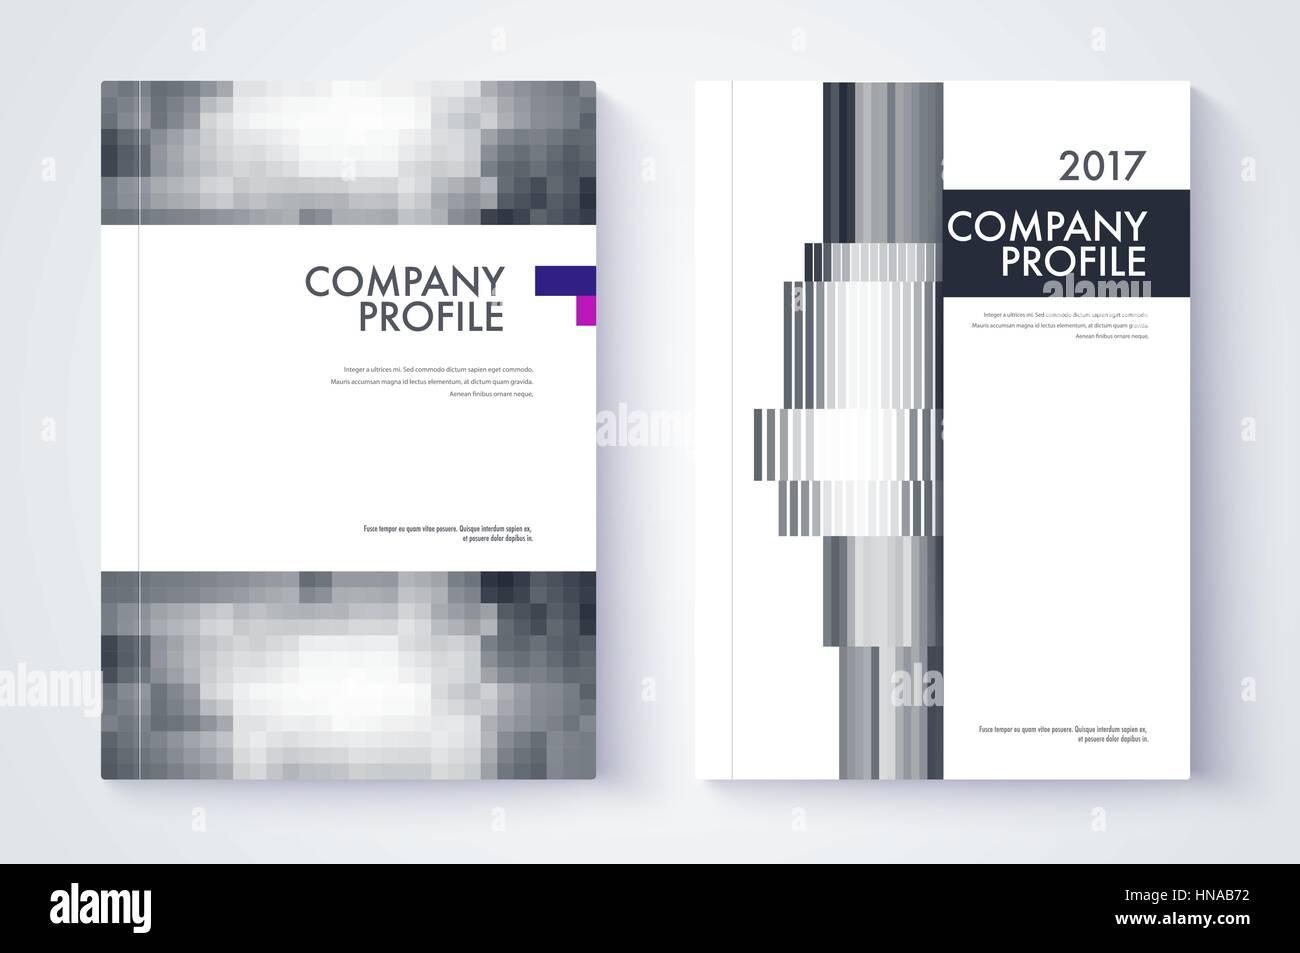 company profile template cover design vector template background